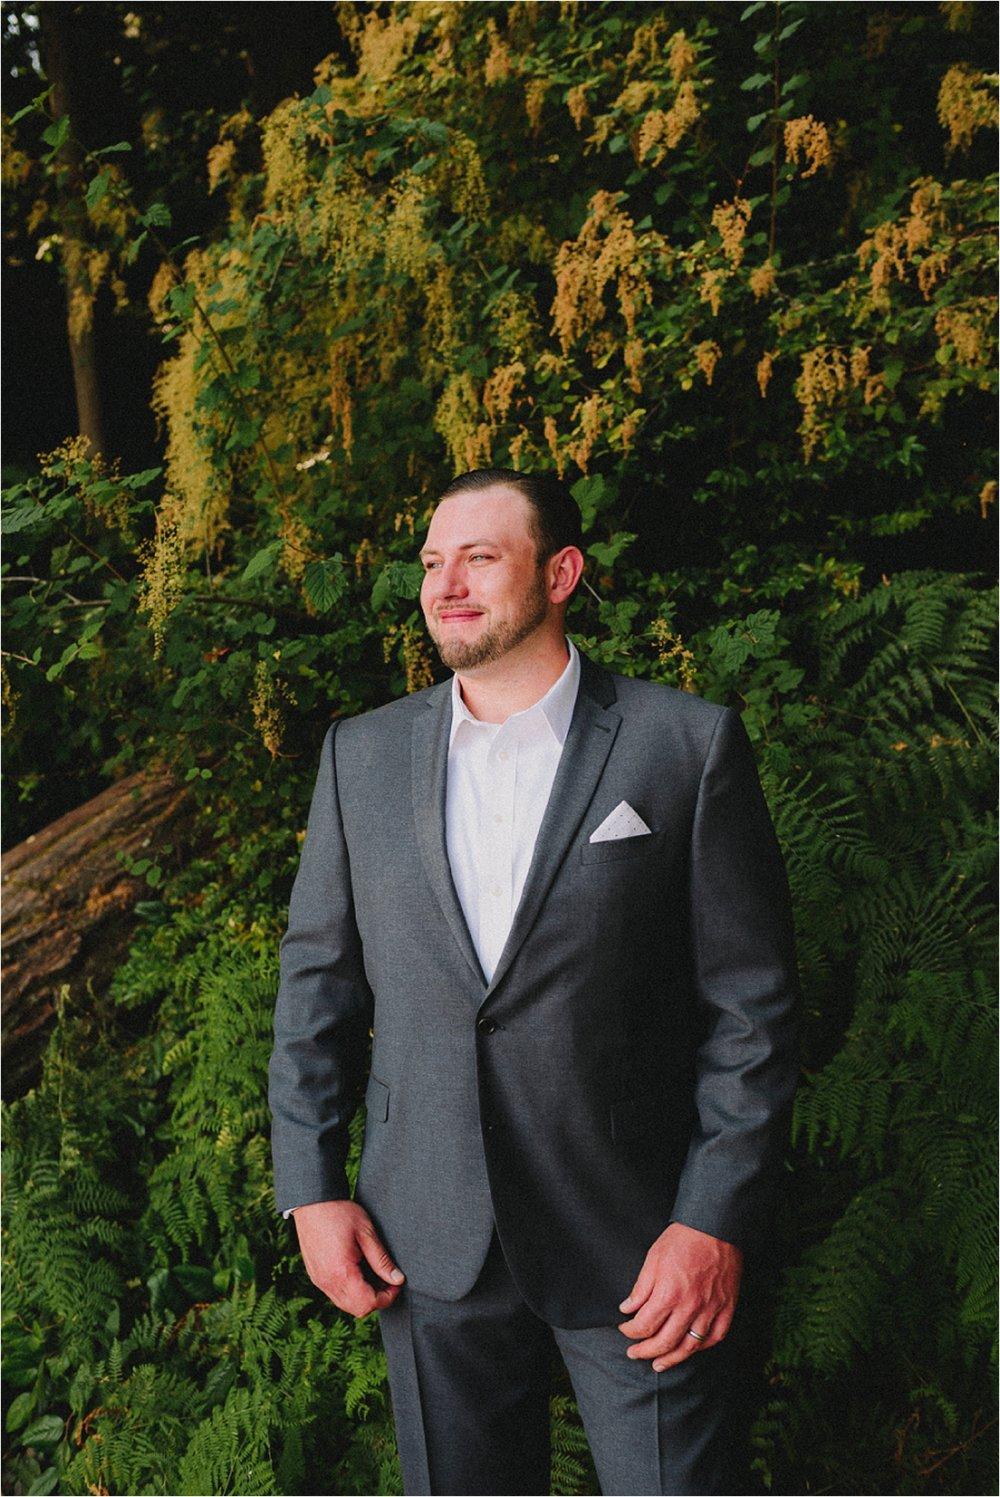 owen-beach-priest-point-park-tacoma-washington-elopement-jannicka-mayte-anchorage-alaska-wedding-elopement-photographer (22).jpg